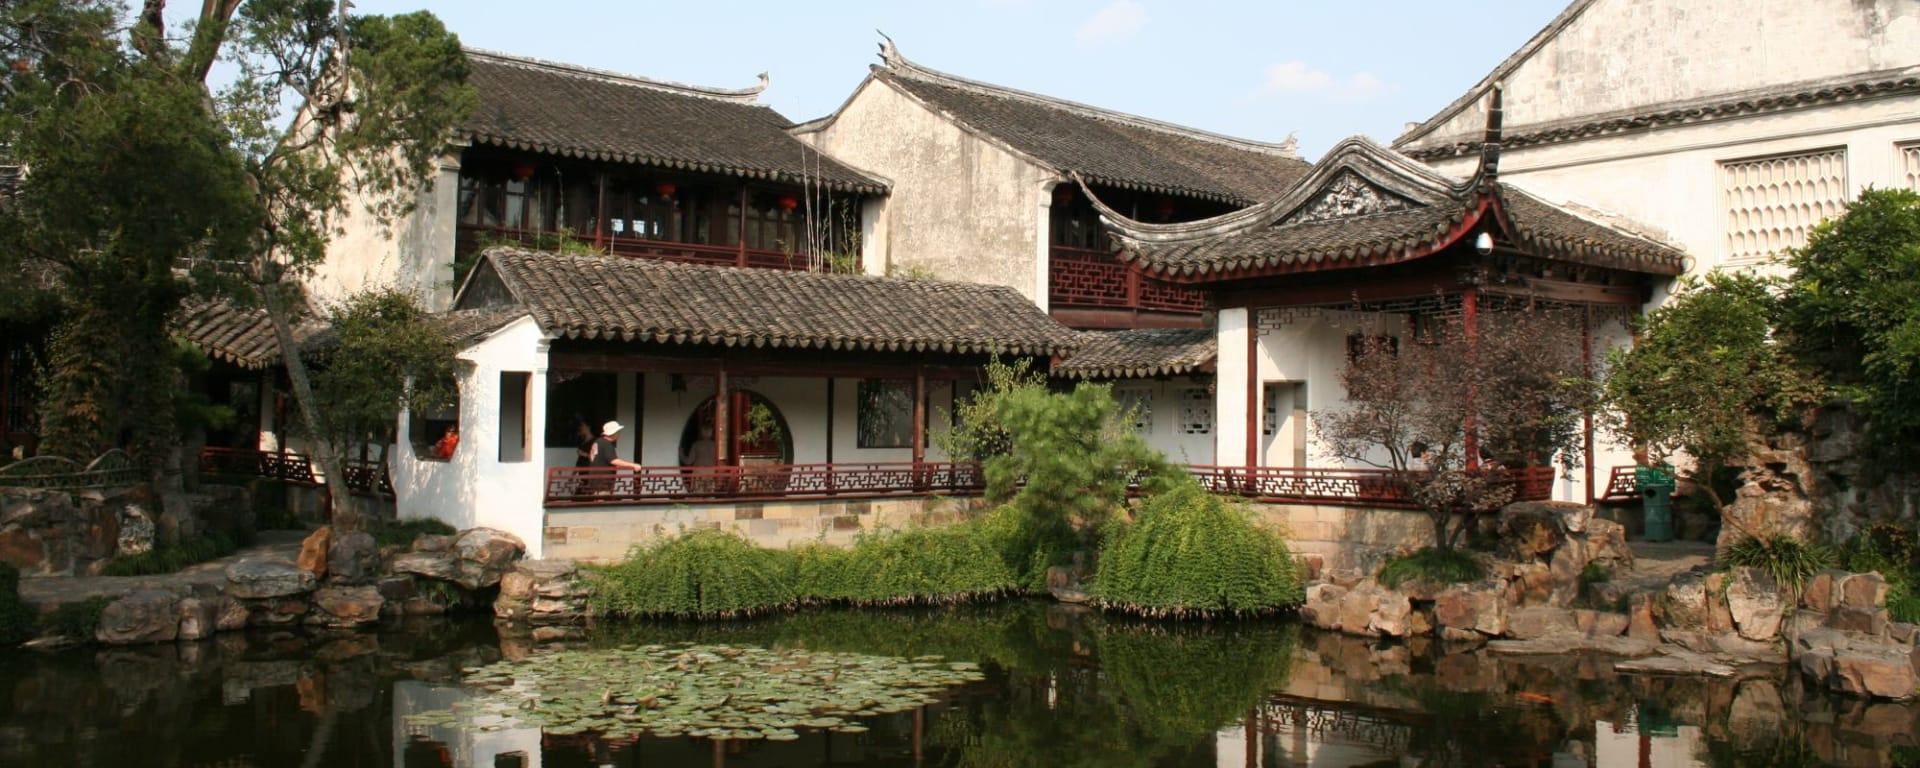 Gartenstadt Suzhou in Shanghai: Suzhou: Old city